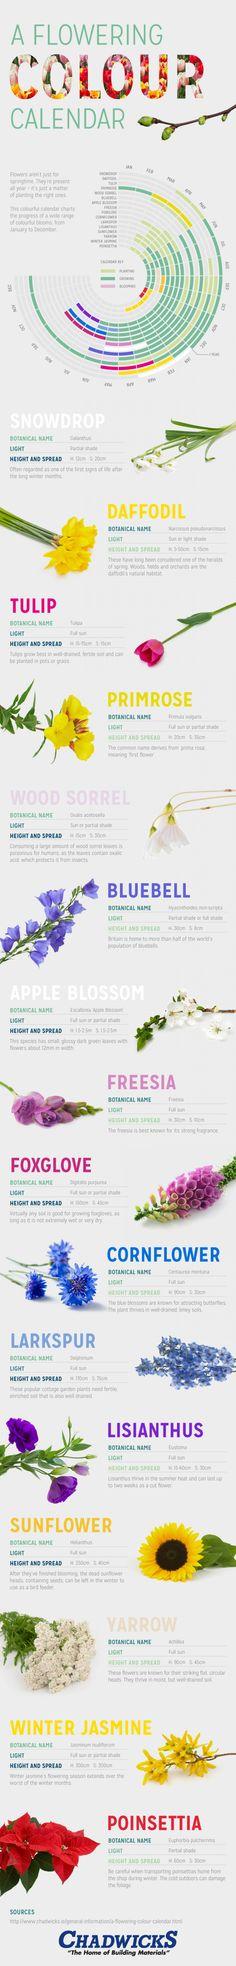 A Flowering Colour Calendar by chadwicks.ie #Infographic #Flower_Calendar